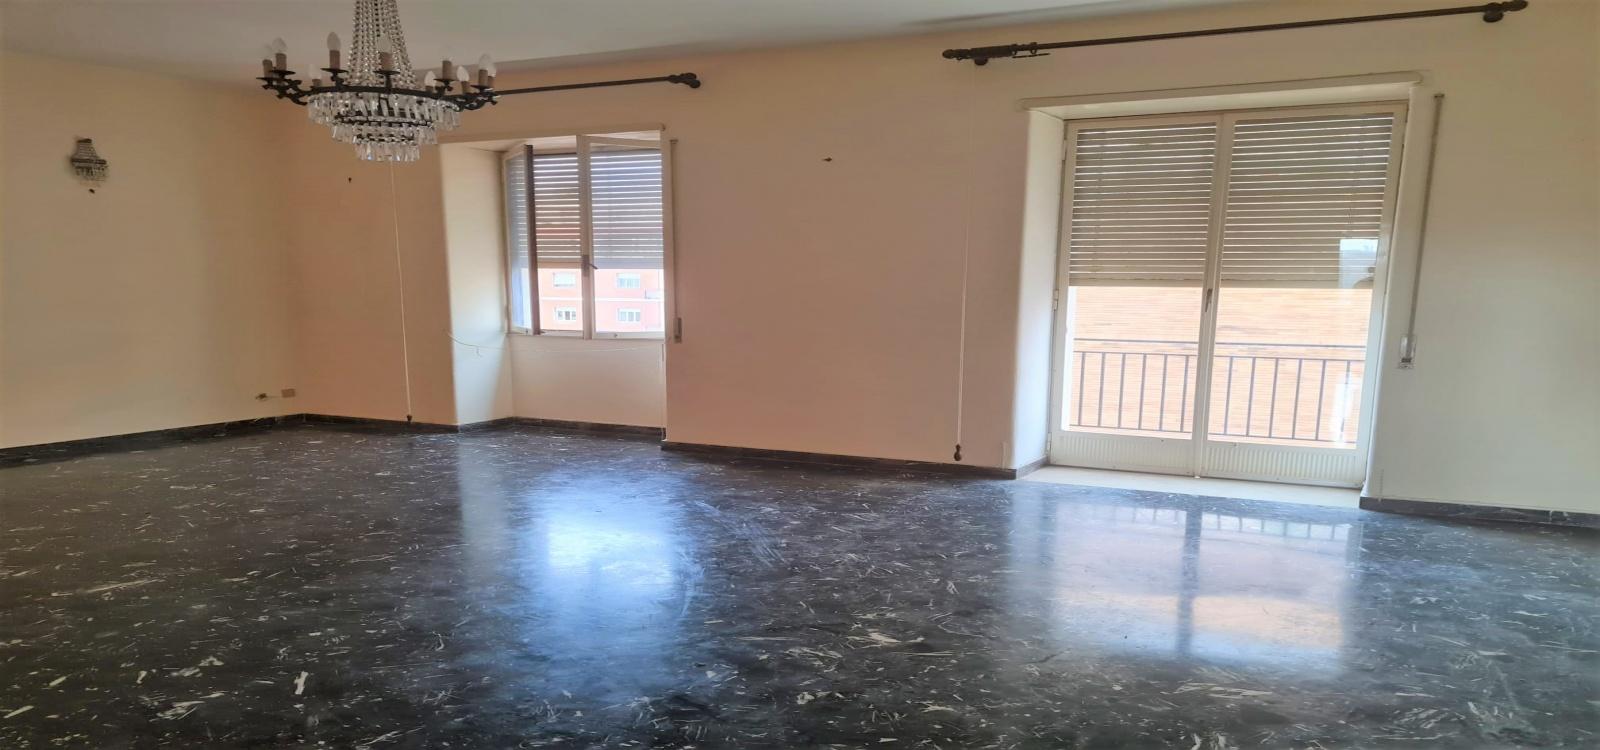 zona gelone,Appartamento,zona gelone,2445